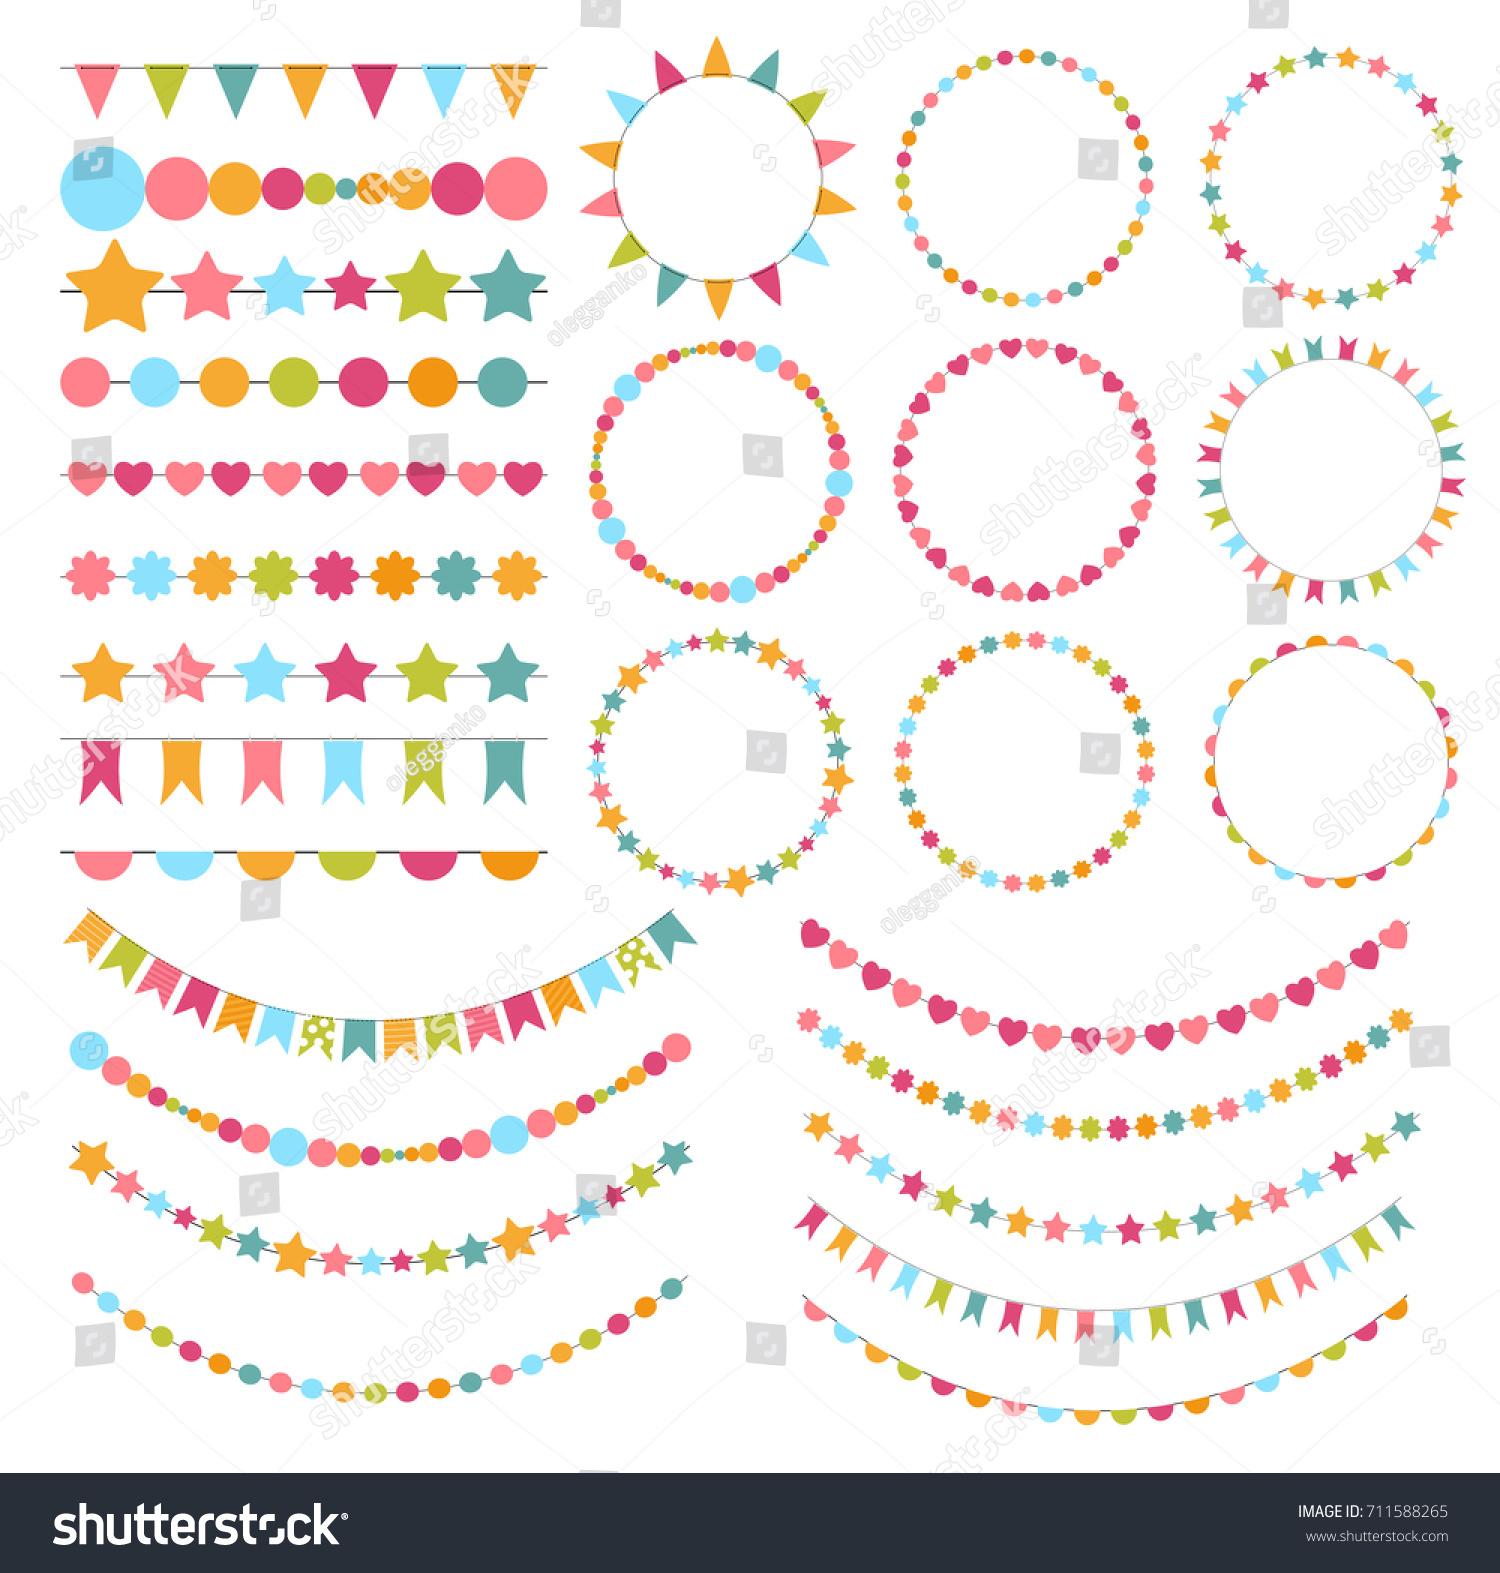 A Party Invitation Choice Image - Party Invitations Ideas